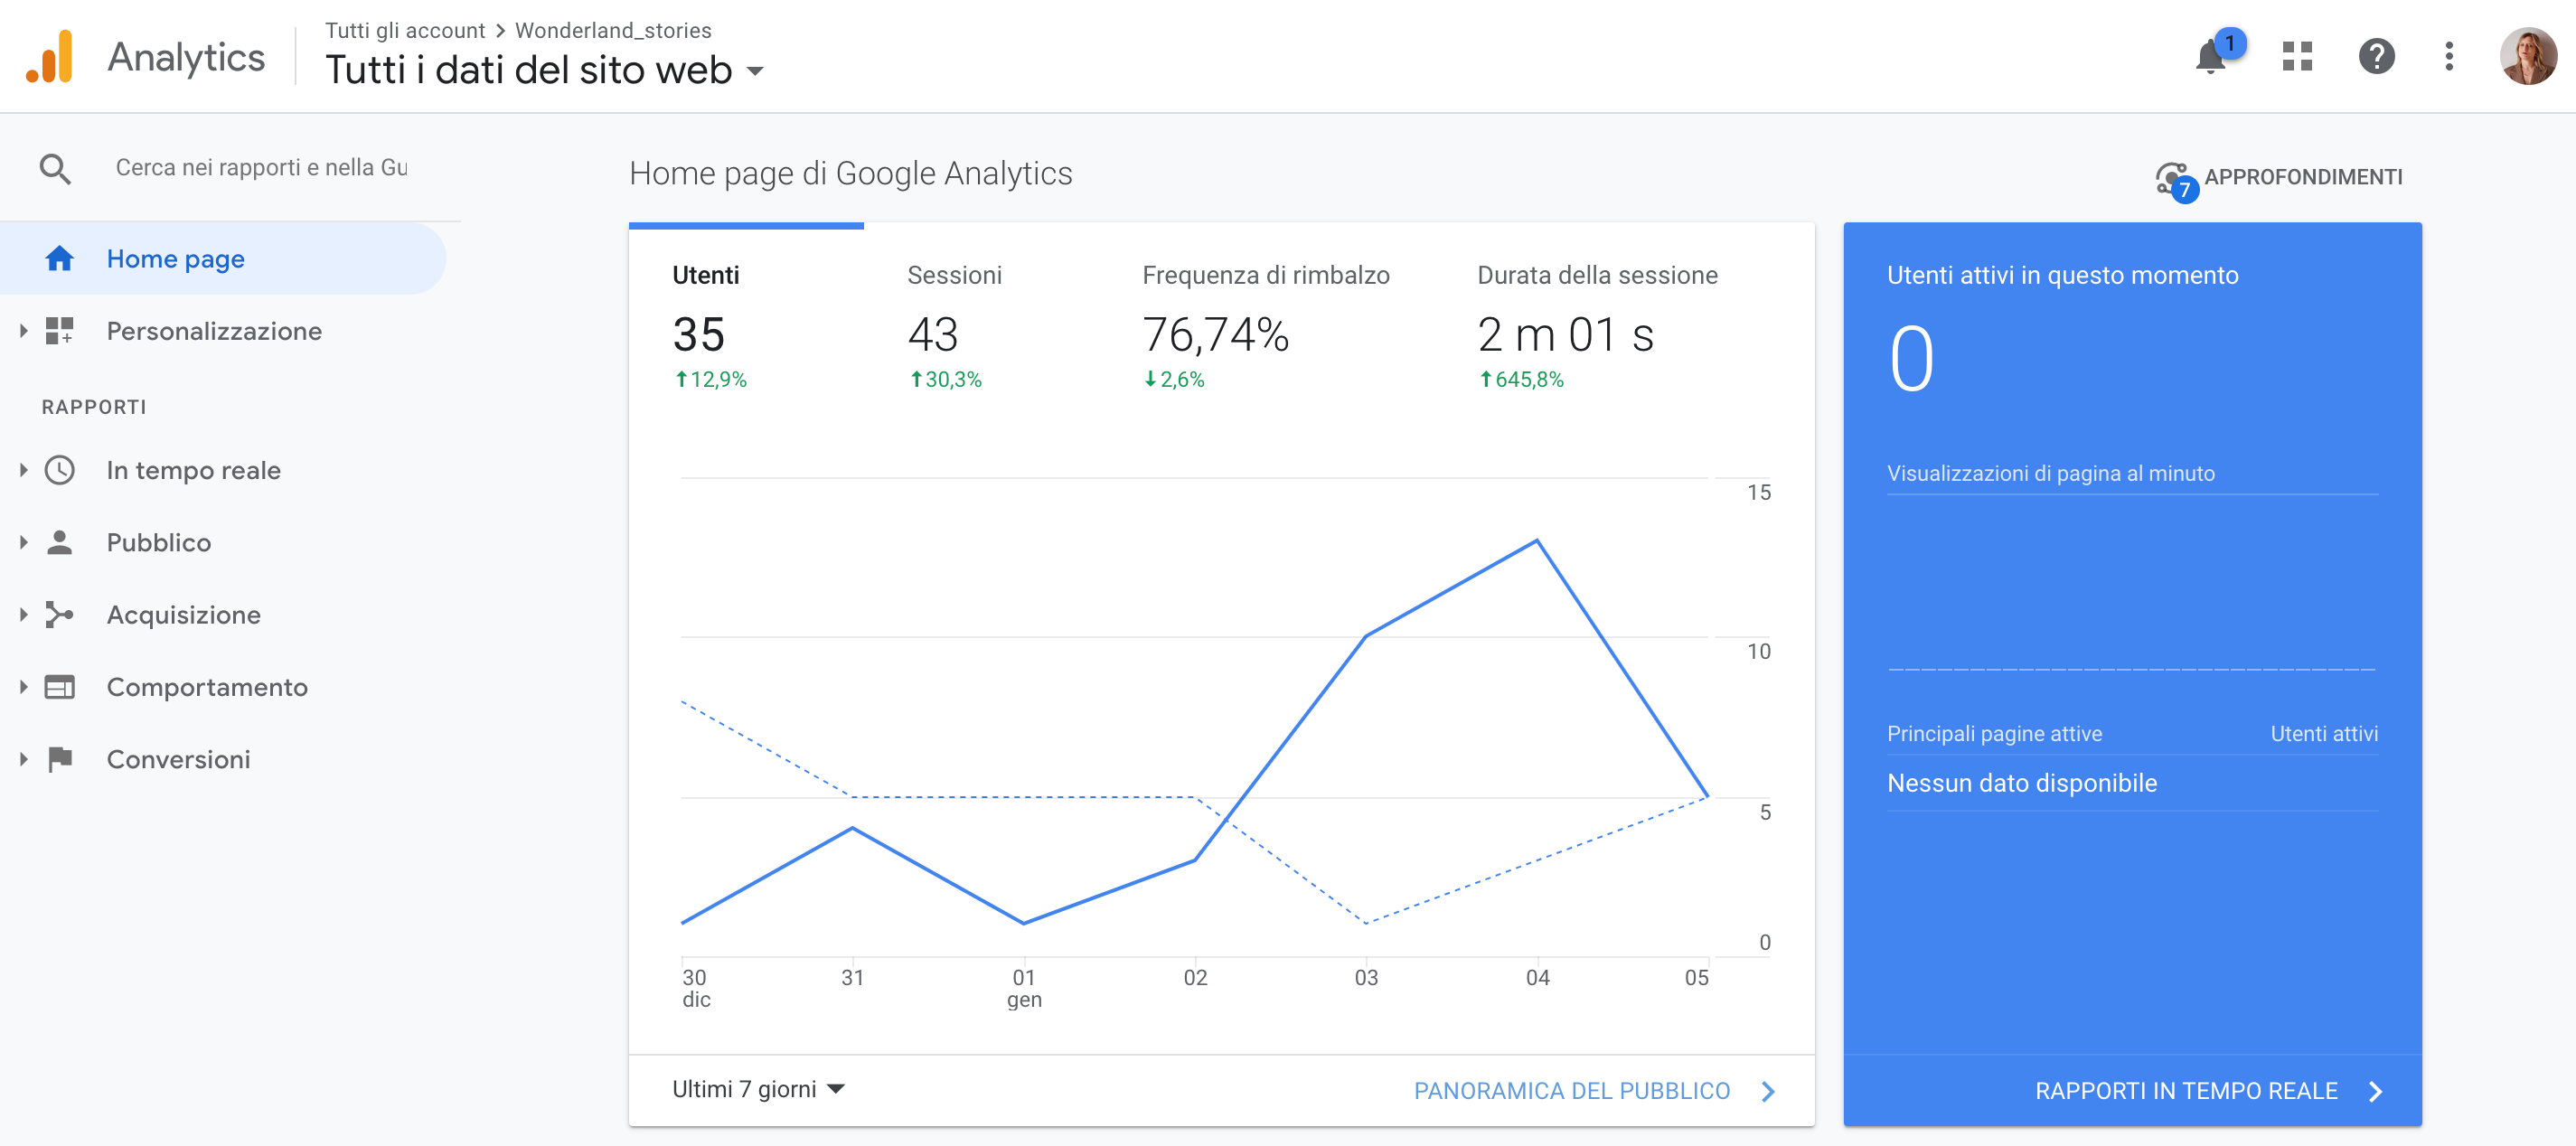 analytics la home page